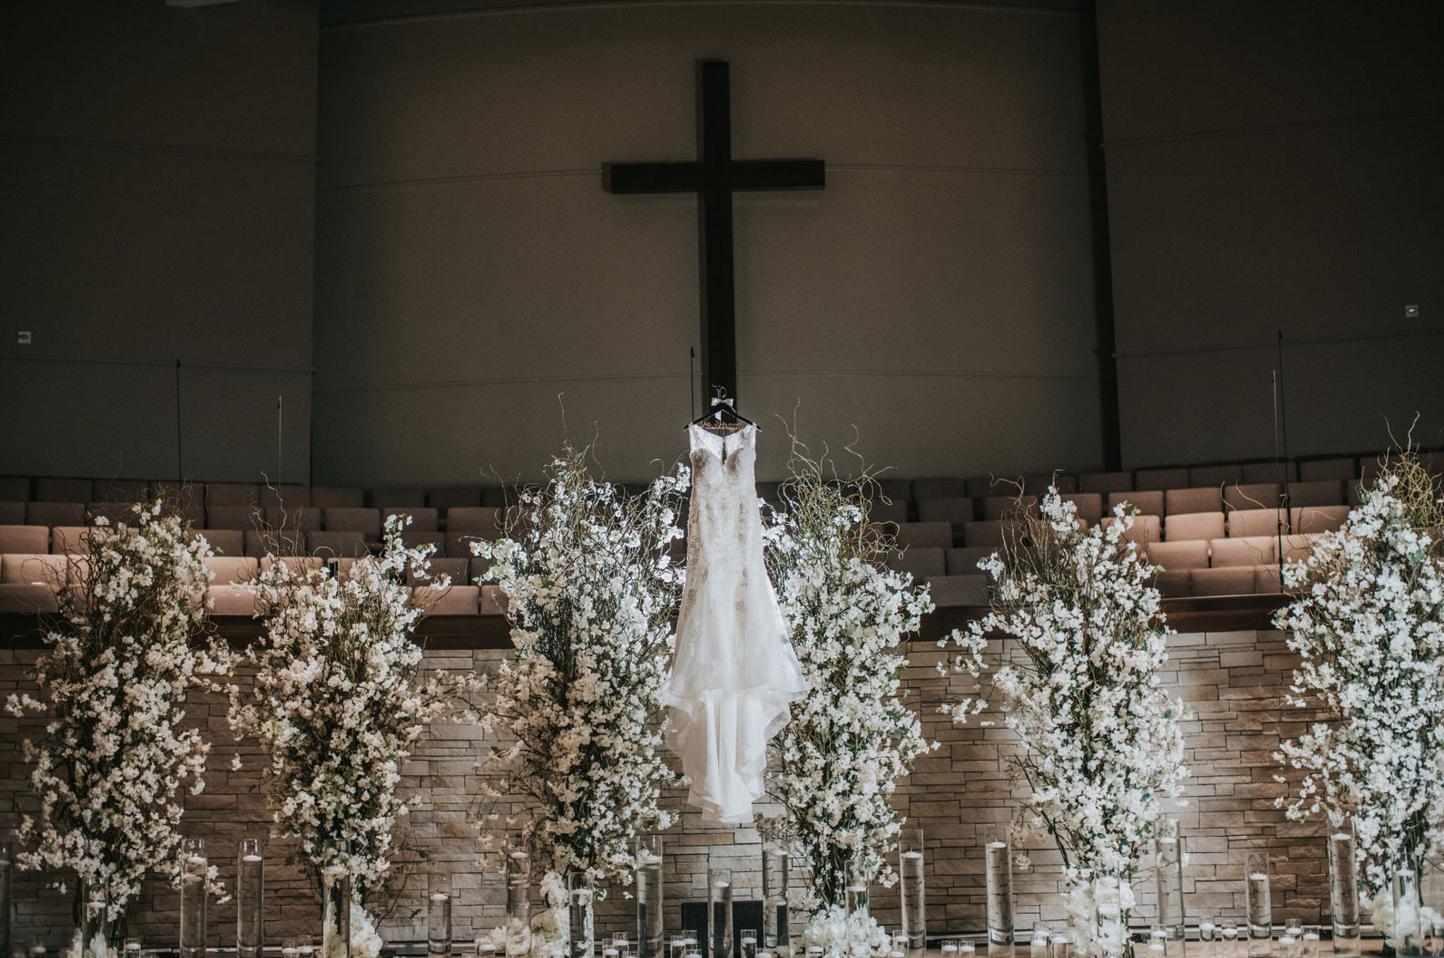 Floral Ceremony Backdrop | Downtown Dallas Church Wedding